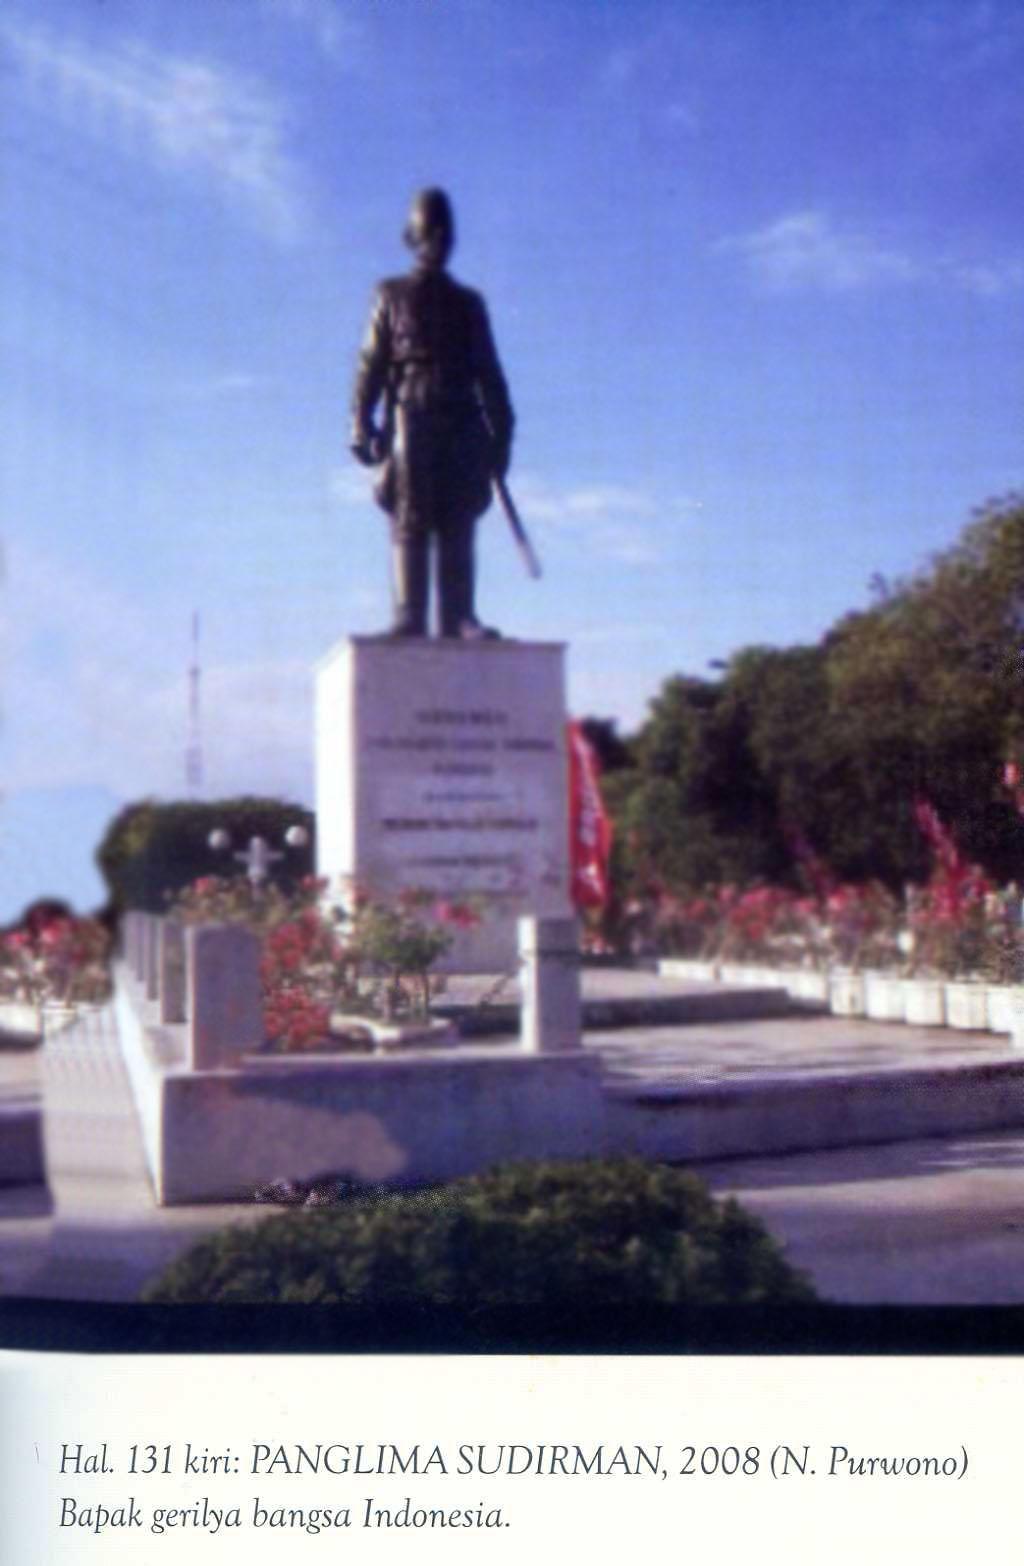 Patung Perjuangan Kota Surabaya Pusaka Jawatimuran Melacak Monumen Geriliya Jenderal